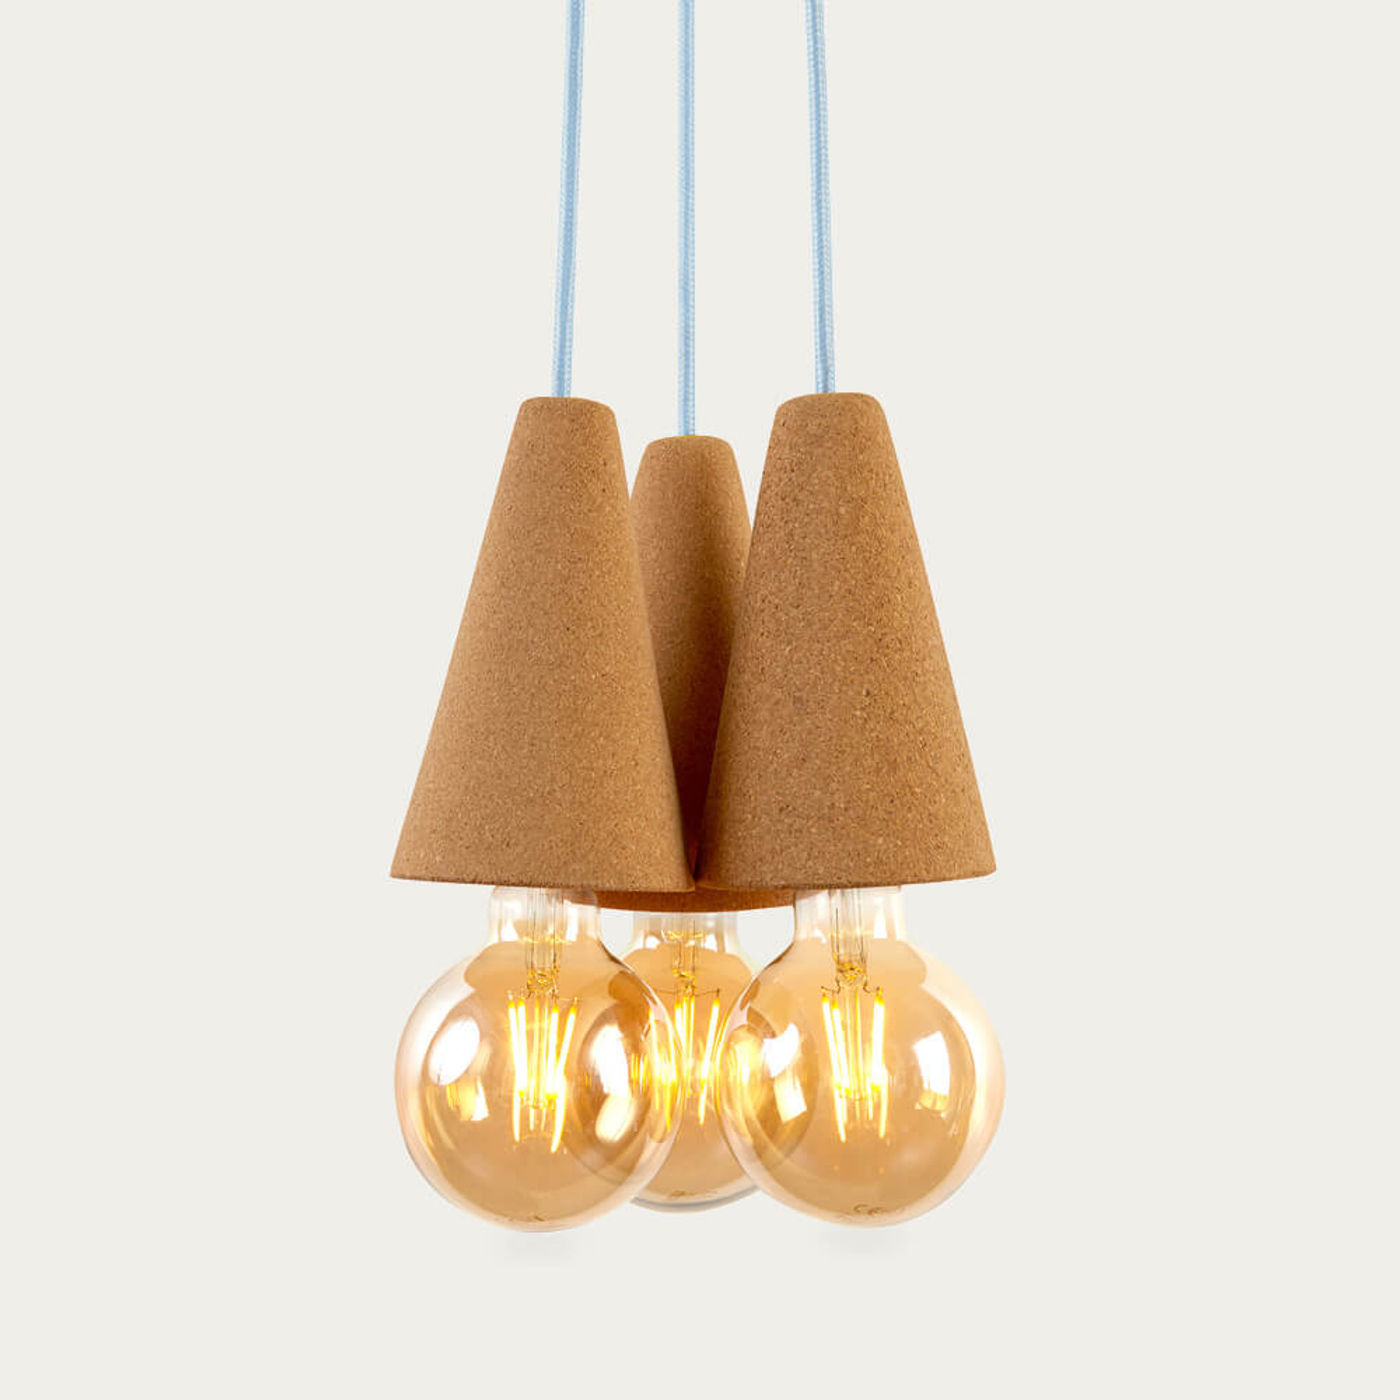 Light Cork and Blue Cable Sino #3 Pendant Lamp   Bombinate